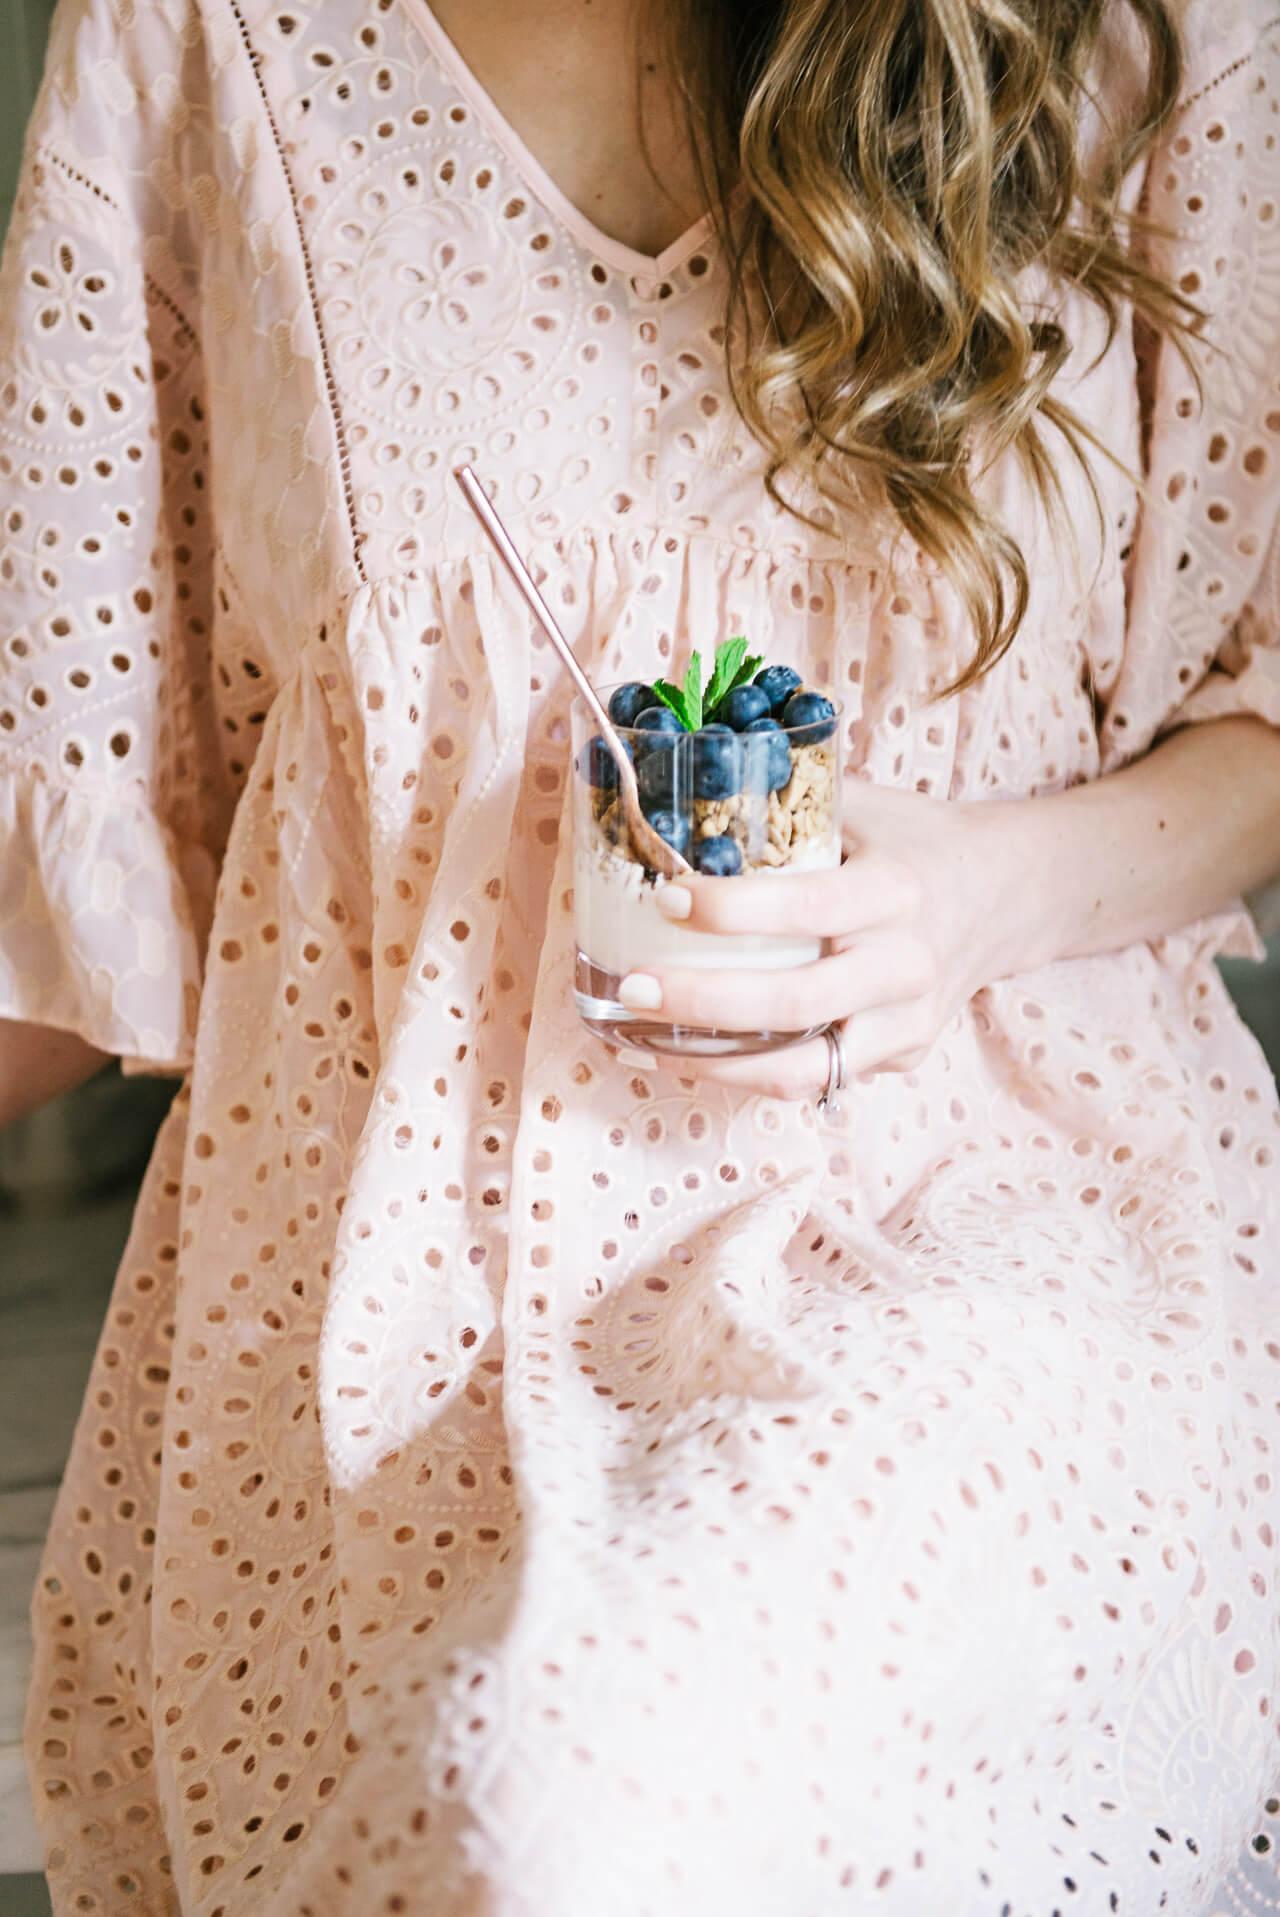 beautiful blueberry parfait with pretty peach dress